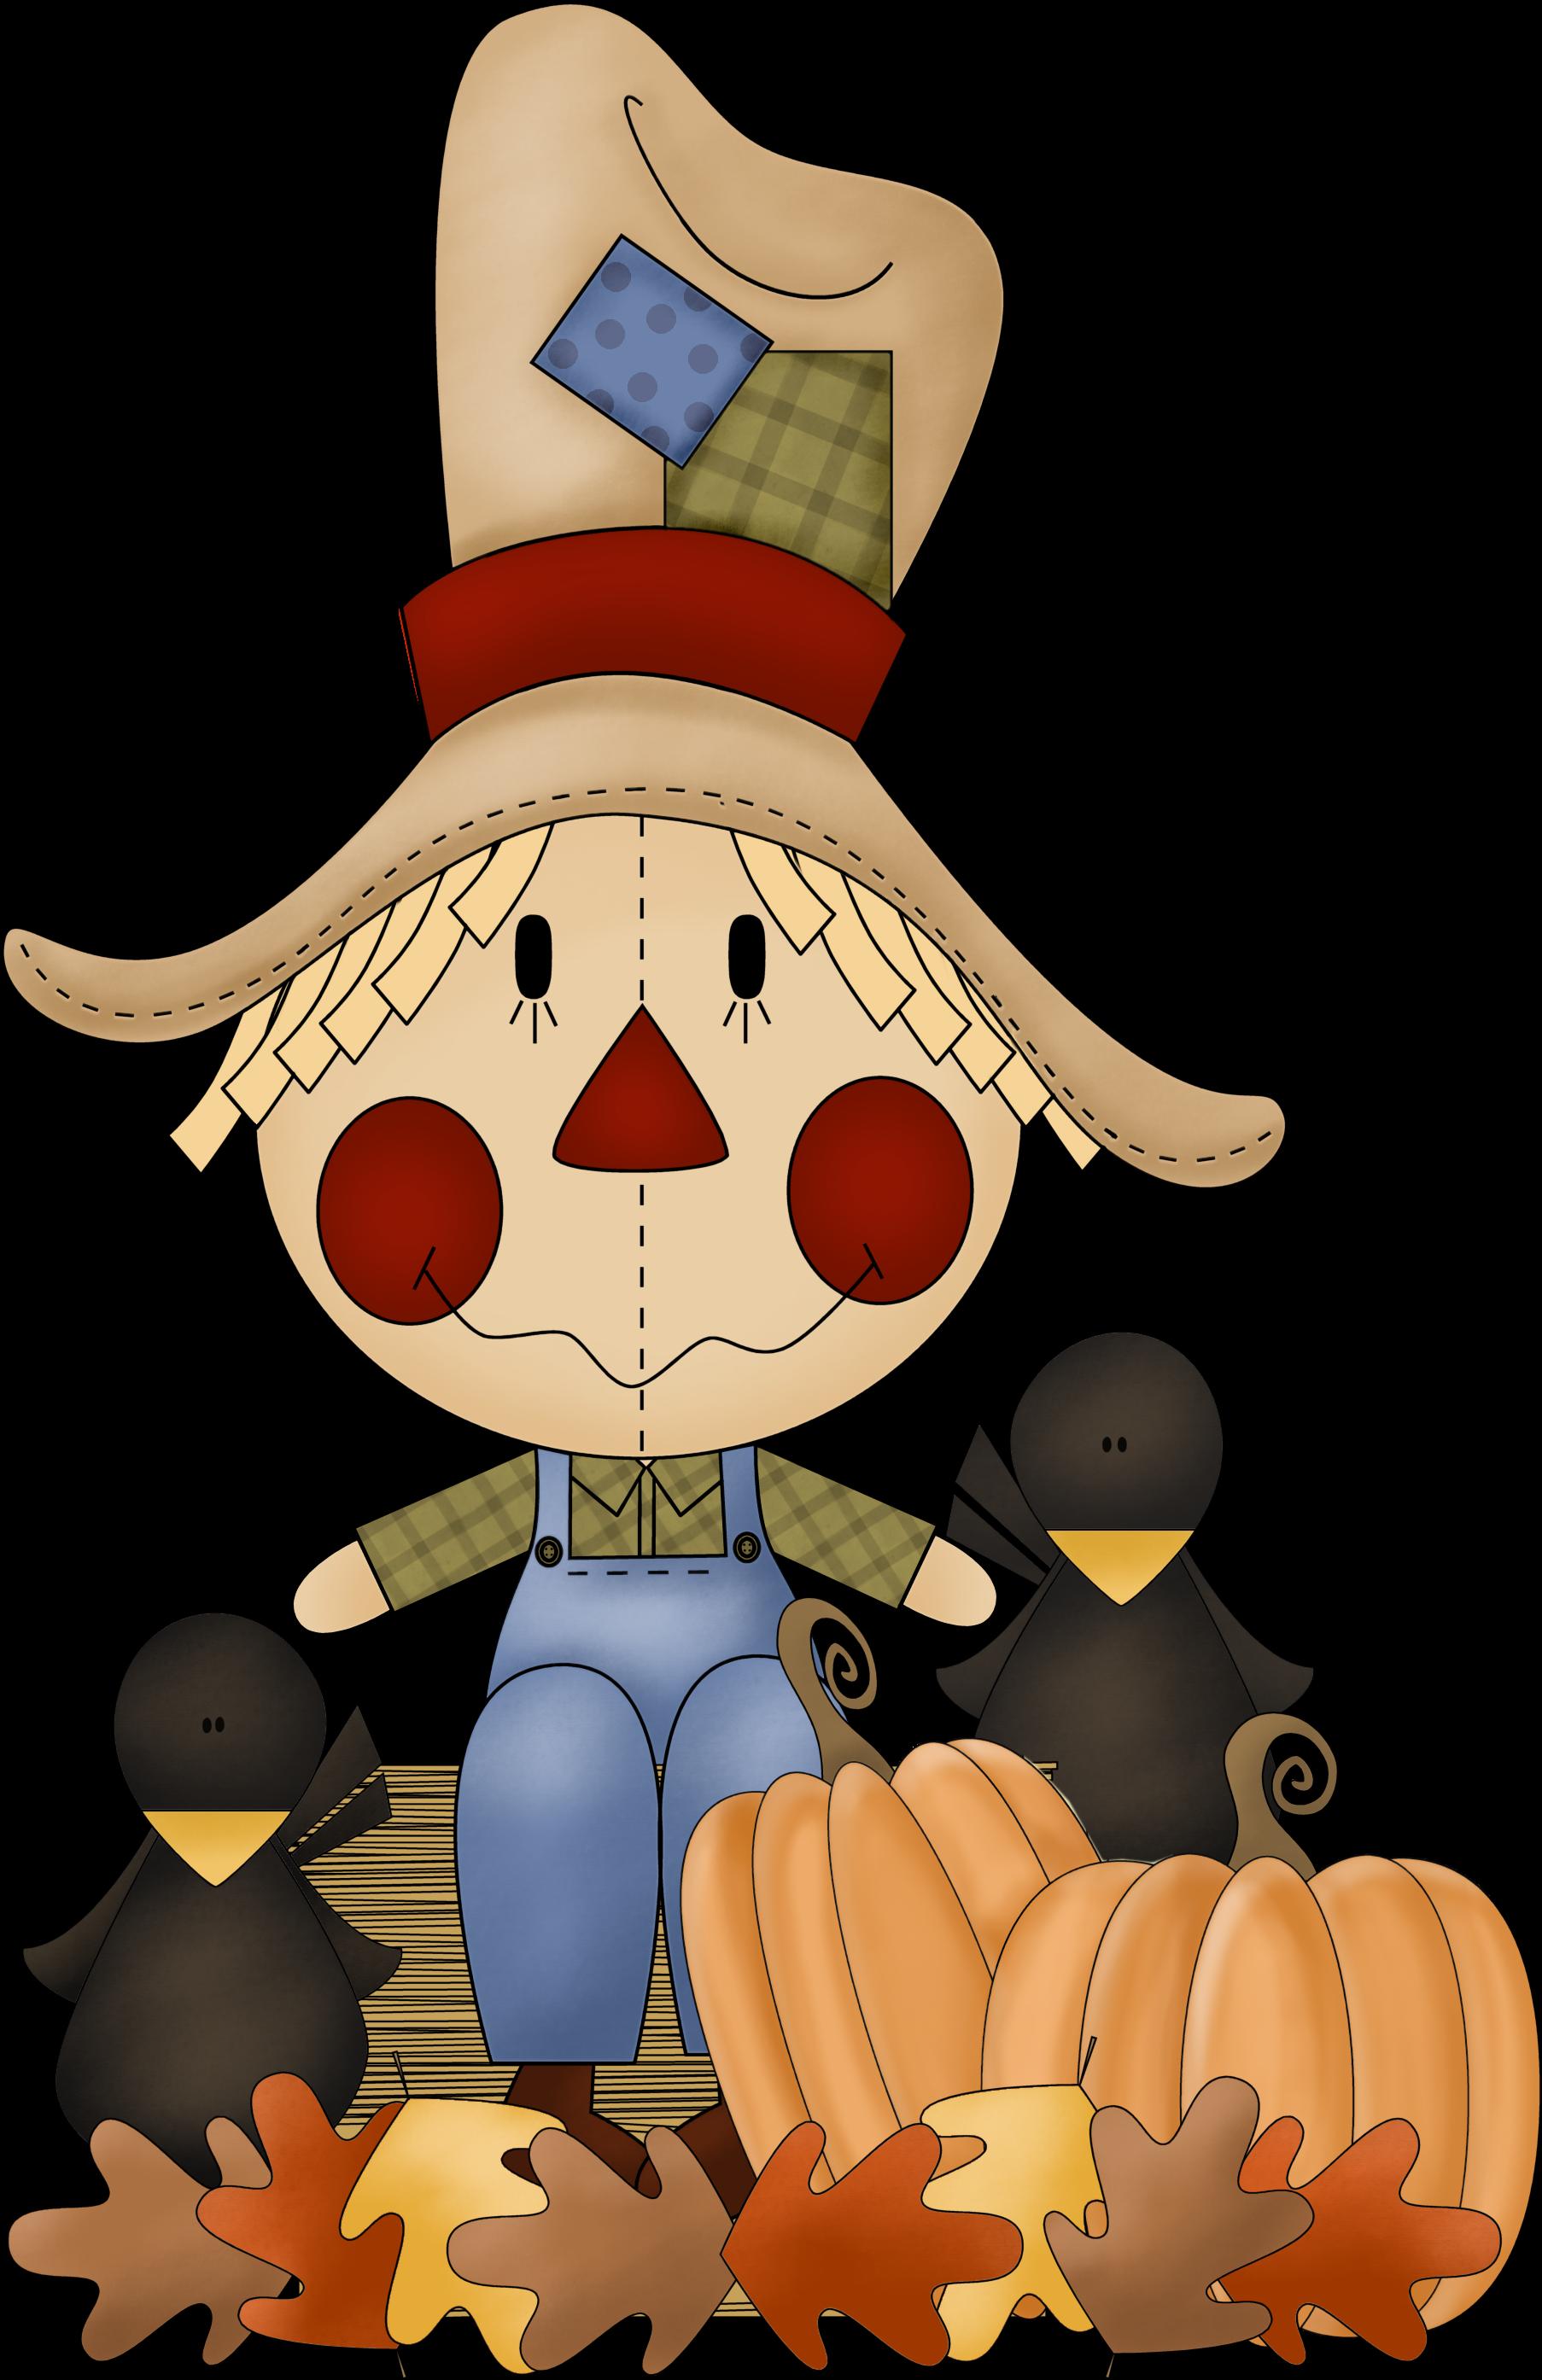 scarecrow clip art fall autumn clipart pinterest espanta pajaros espantap jaros y. Black Bedroom Furniture Sets. Home Design Ideas